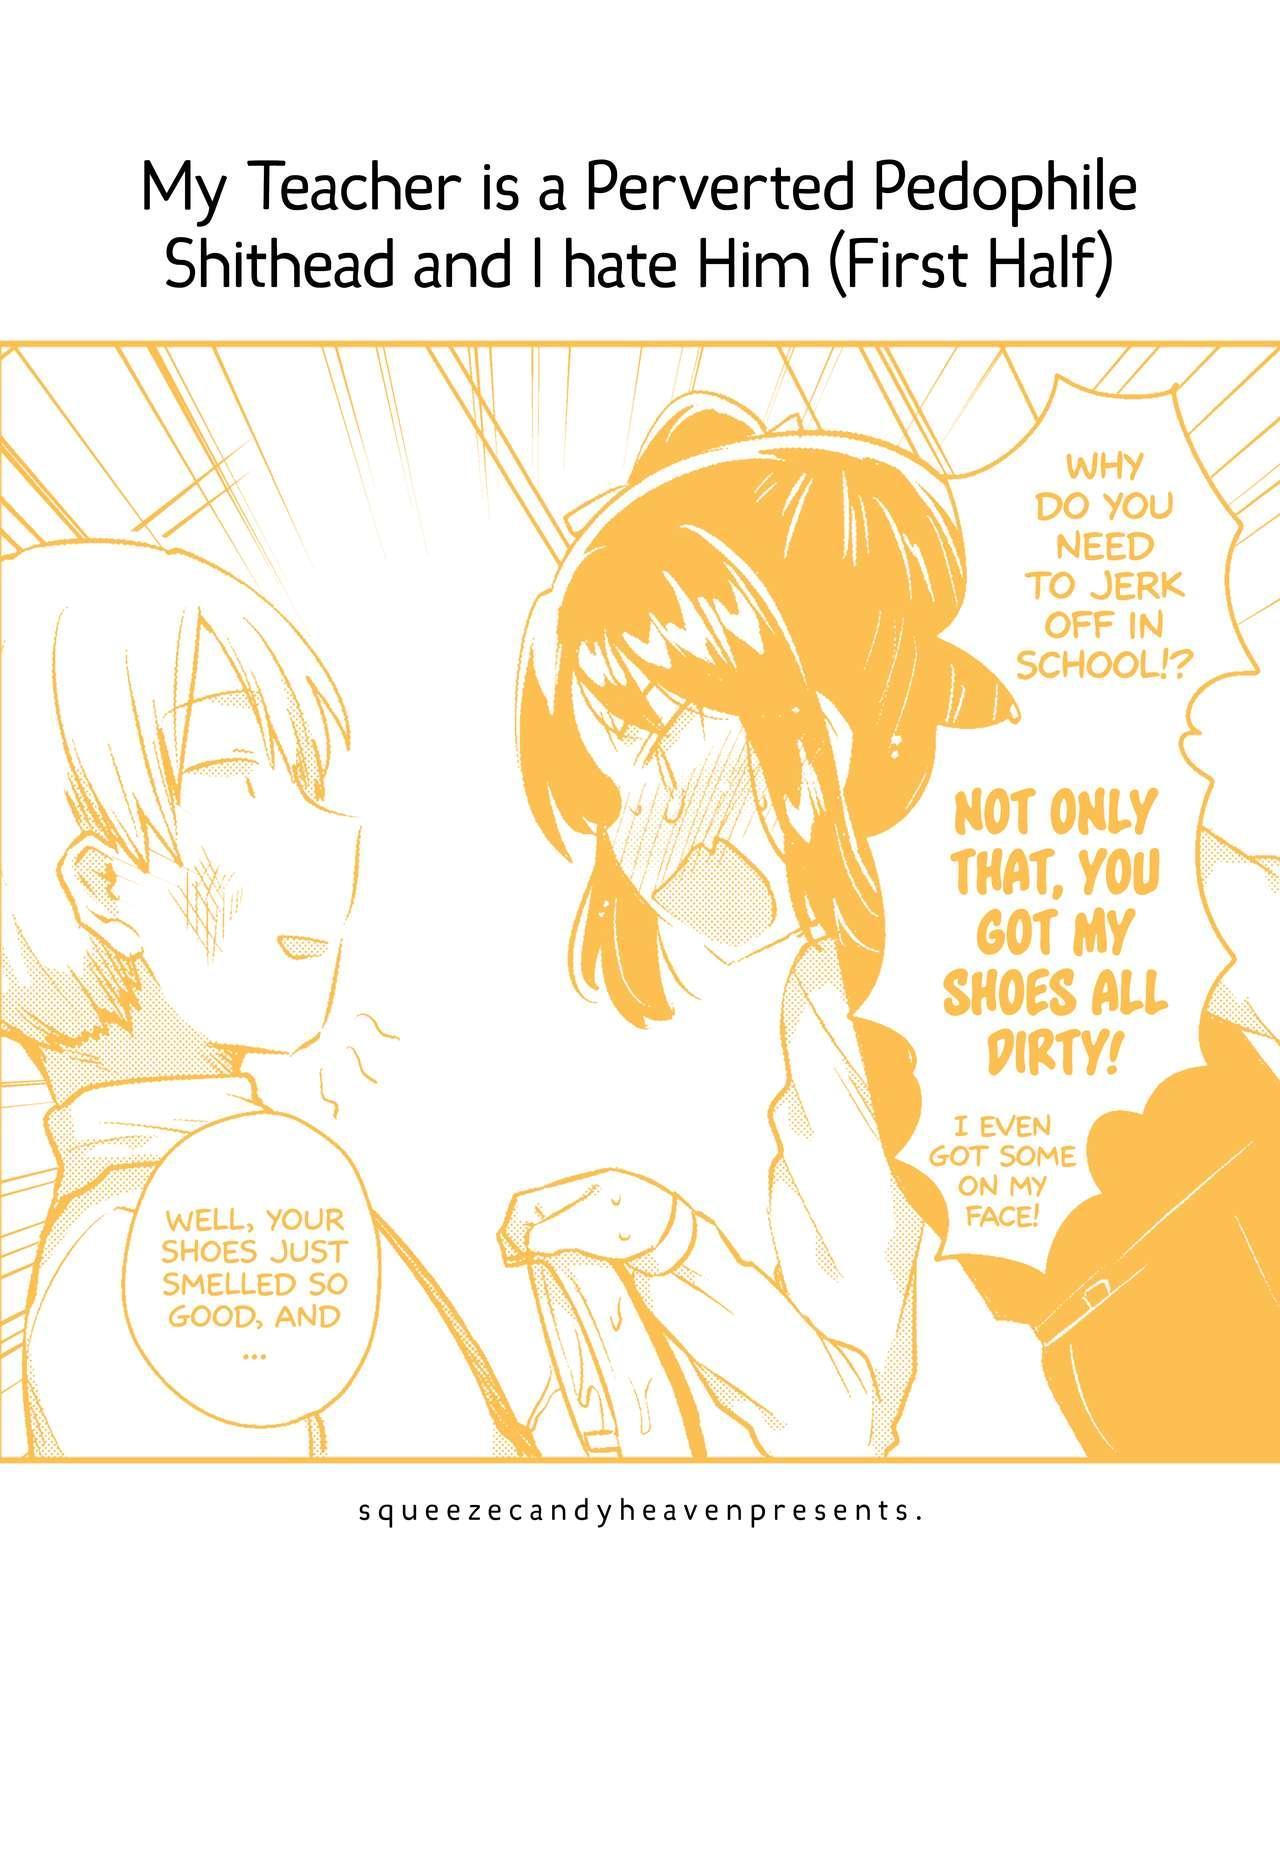 (SC2018 Spring) [squeezecandyheaven (Ichihaya)] Sensei wa Lolicon de Saitei Hentai no Gomikuzu [Zen] + Omake   My Teacher is a Perverted Pedophile Shithead and I Hate Him (First Half) + Bonus Story [English] [ATF] 25